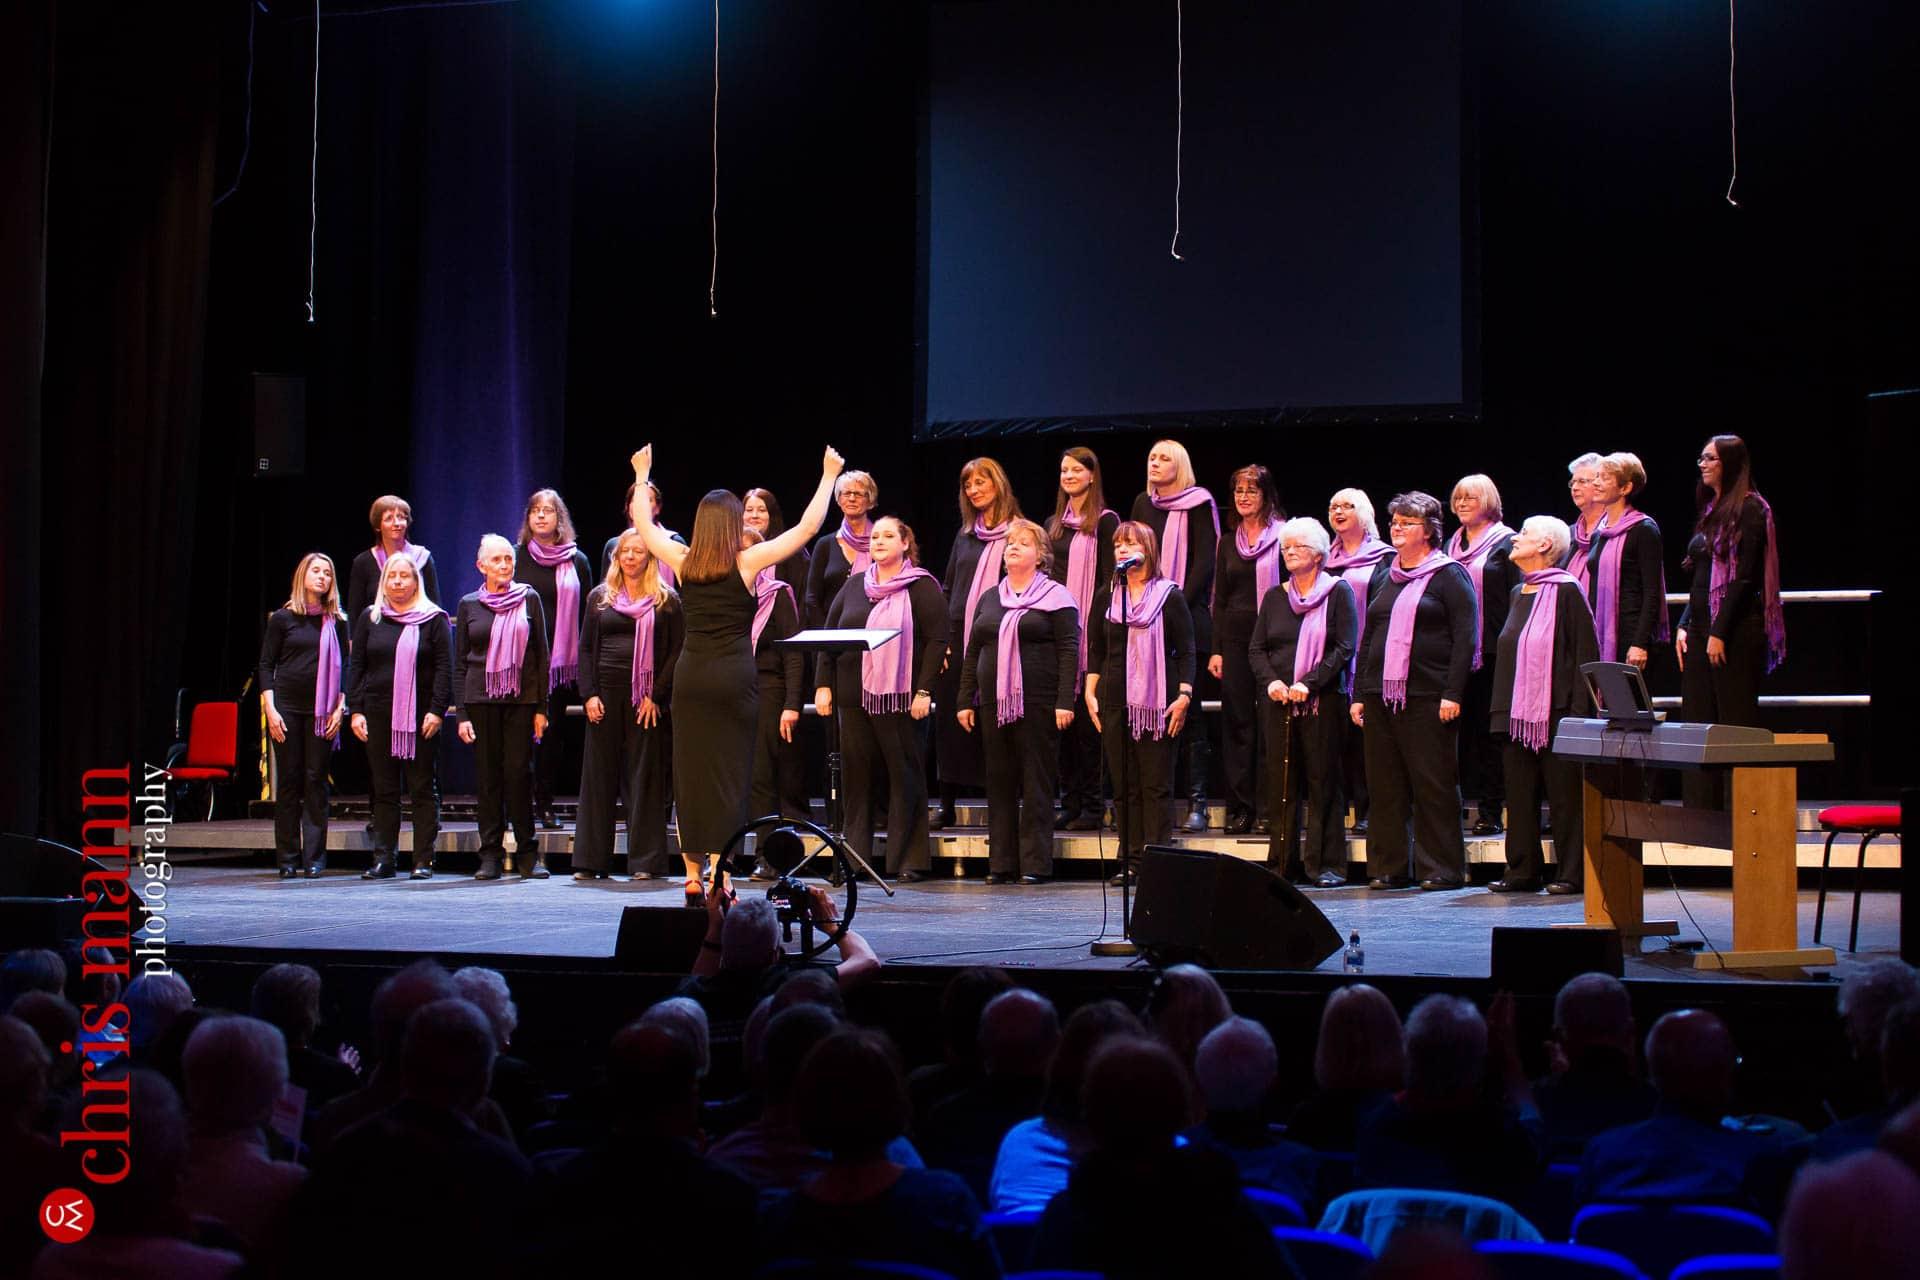 Choiroke-2016-concert-Dorking-Halls-076